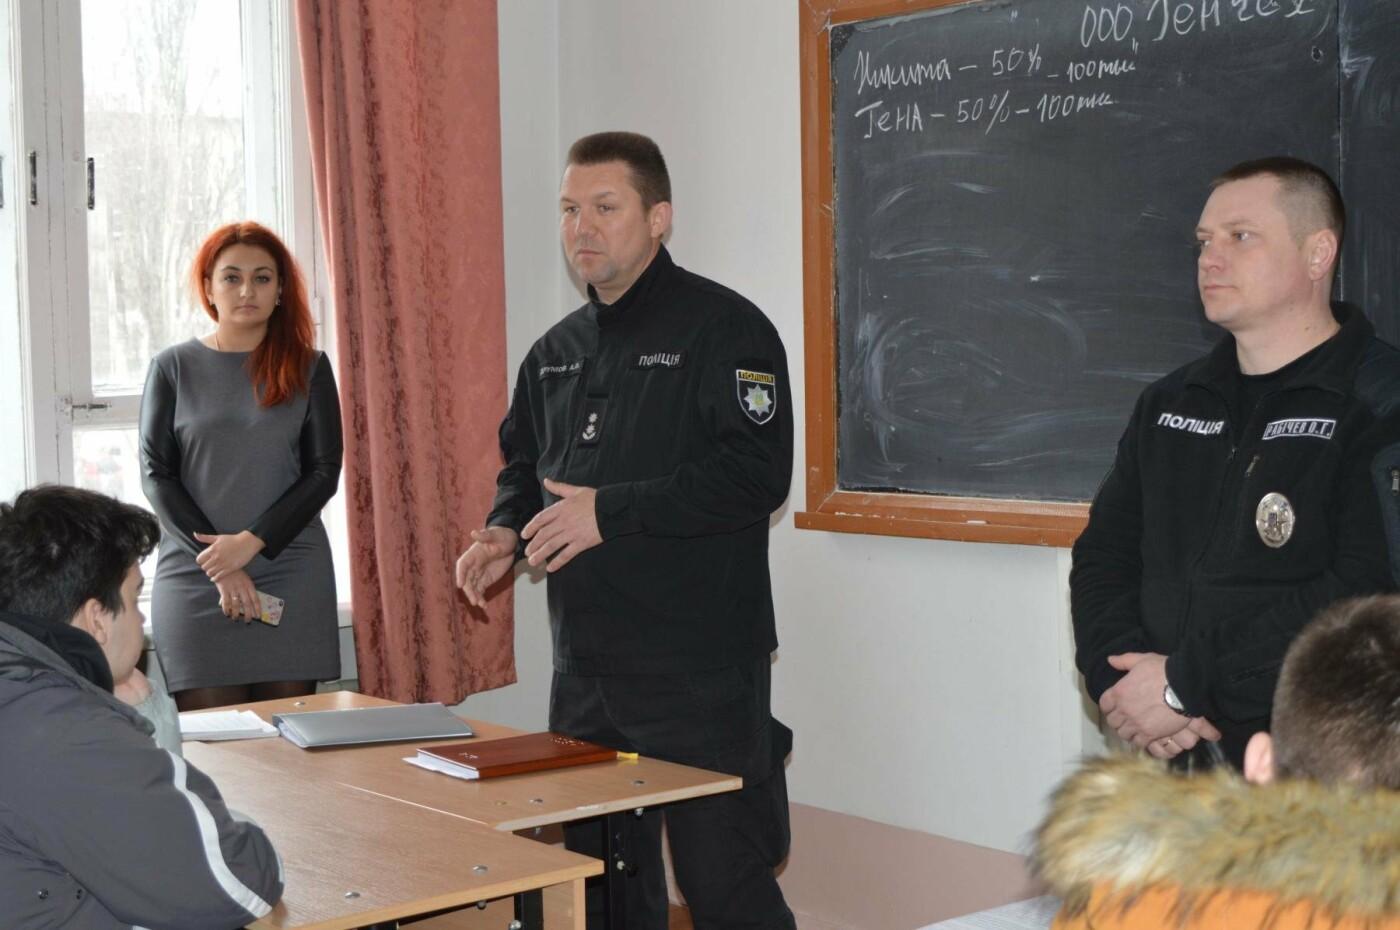 Краматорские правоохранители провели встречу со студентами, фото-1